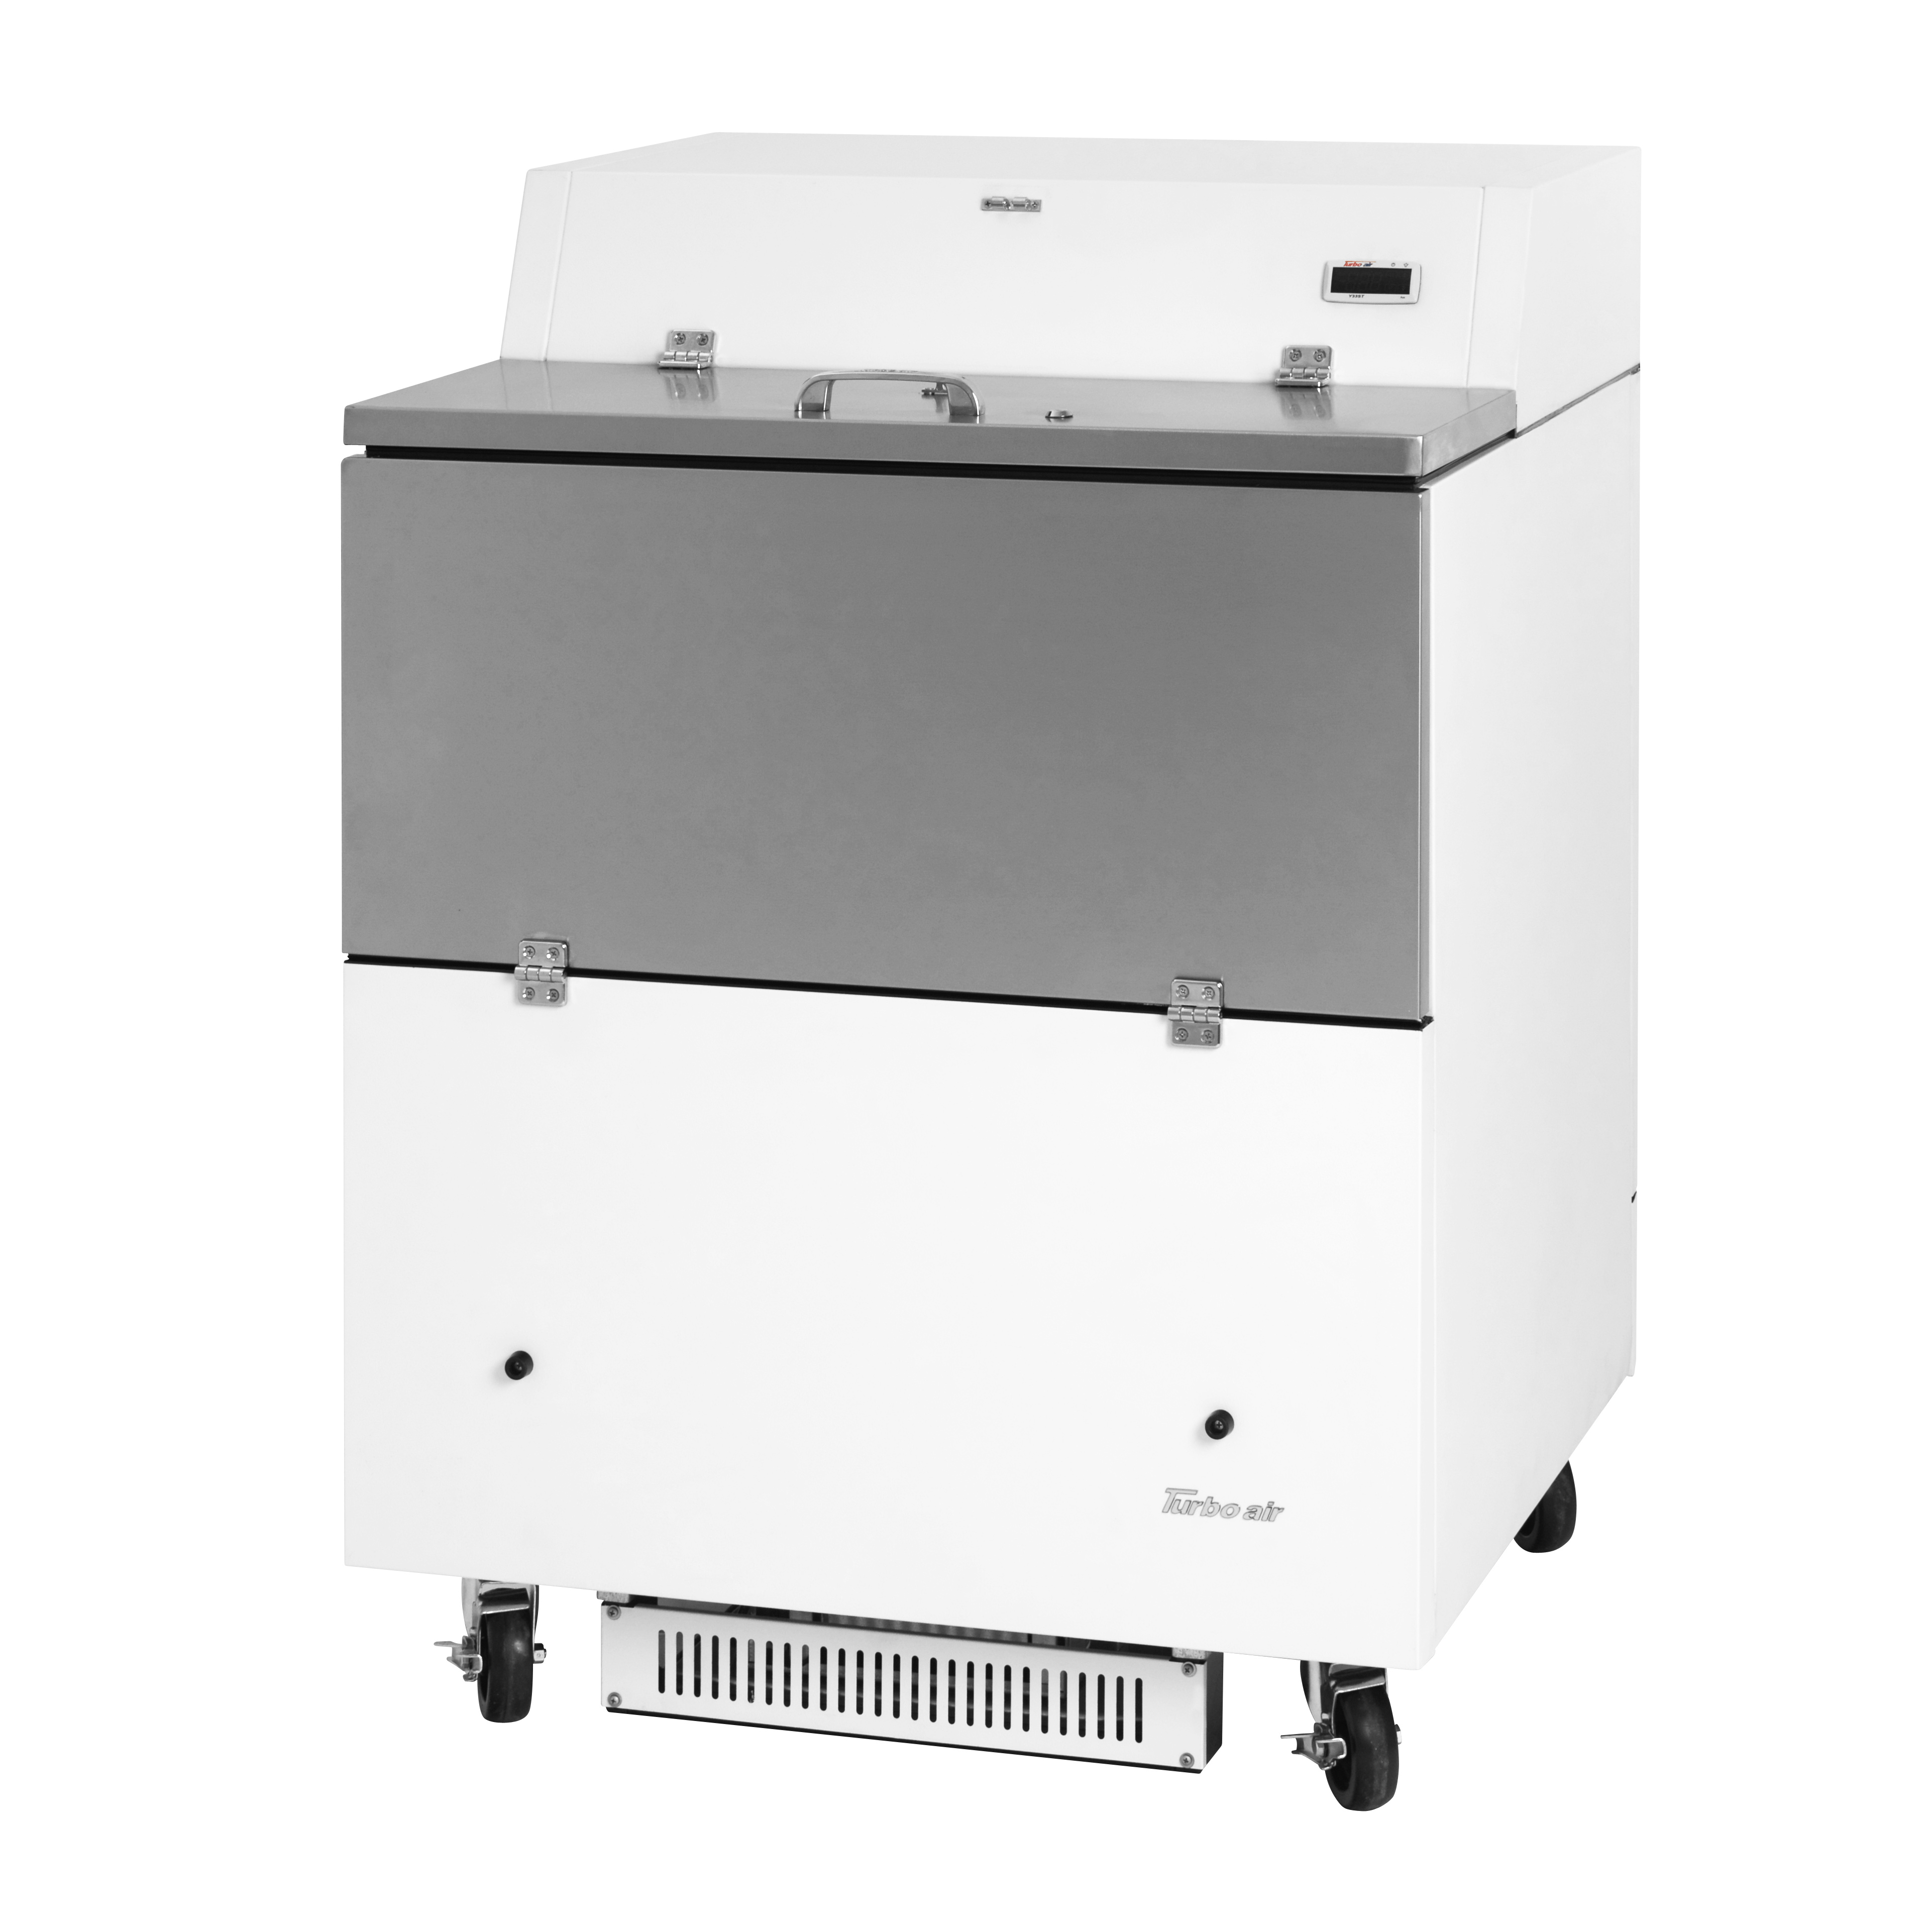 Turbo Air TMKC-34S-N-WS milk cooler / station